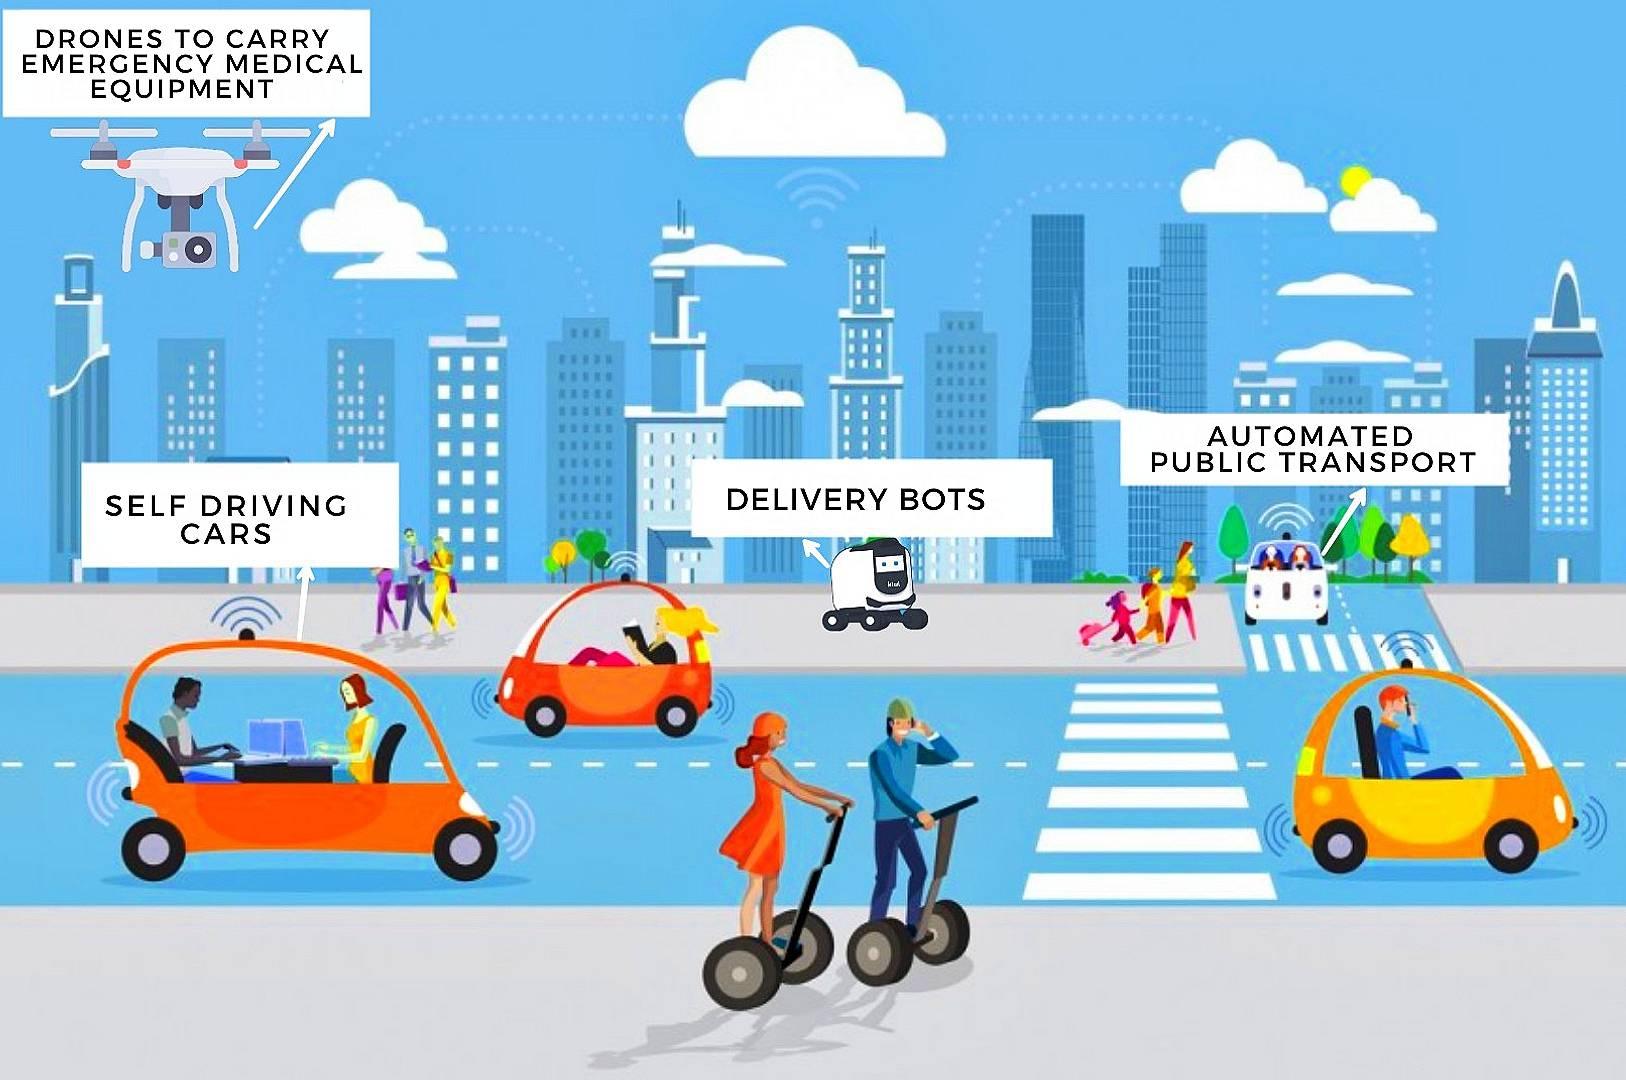 Autonomous Vehicles in smart cities